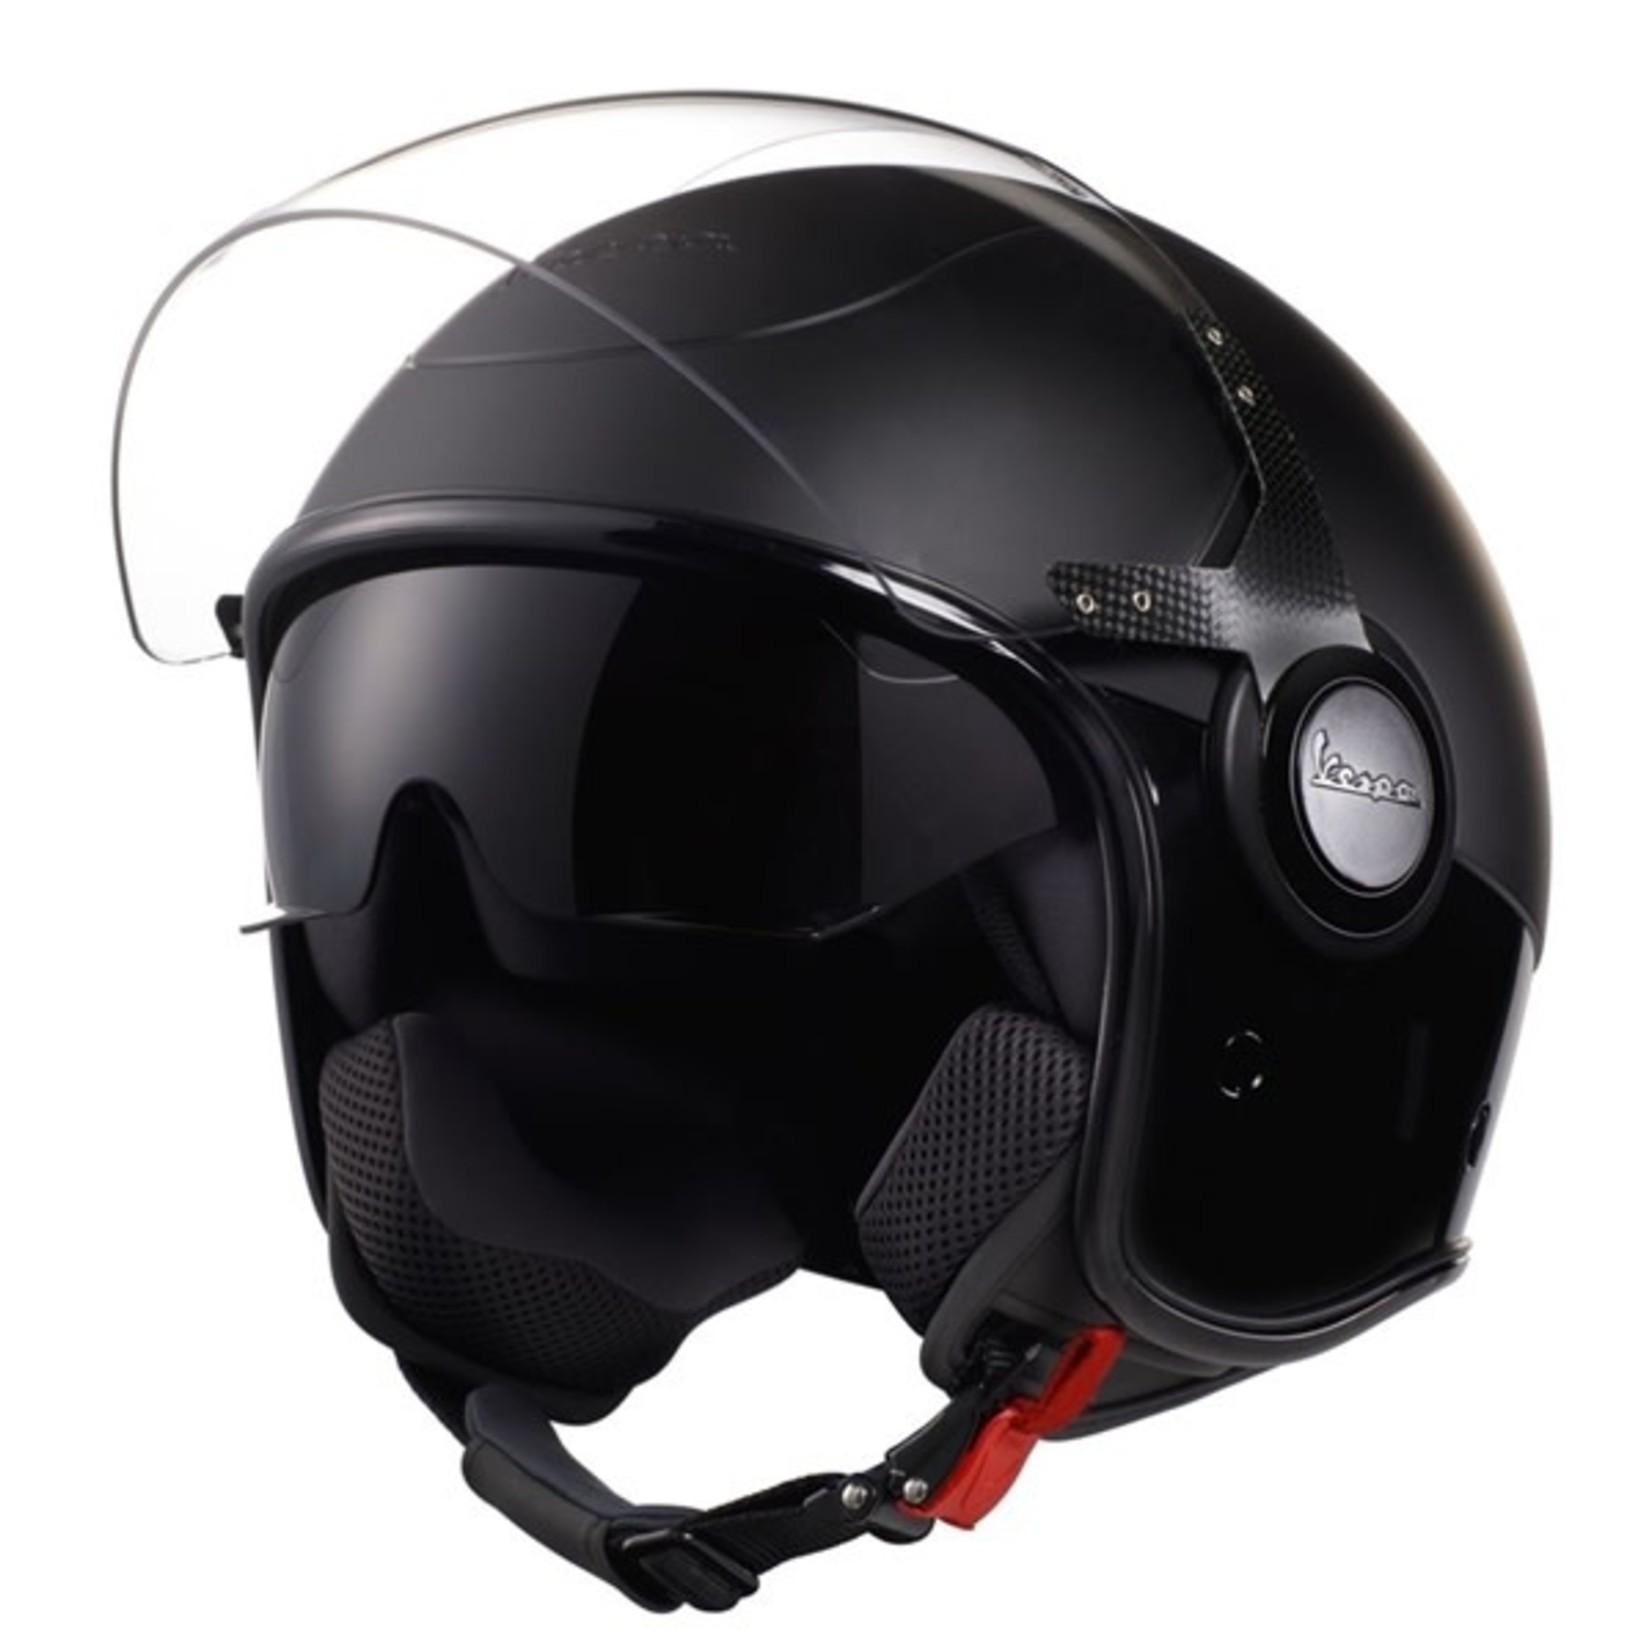 Apparel Helmet, Vespa VJ Notte Edition